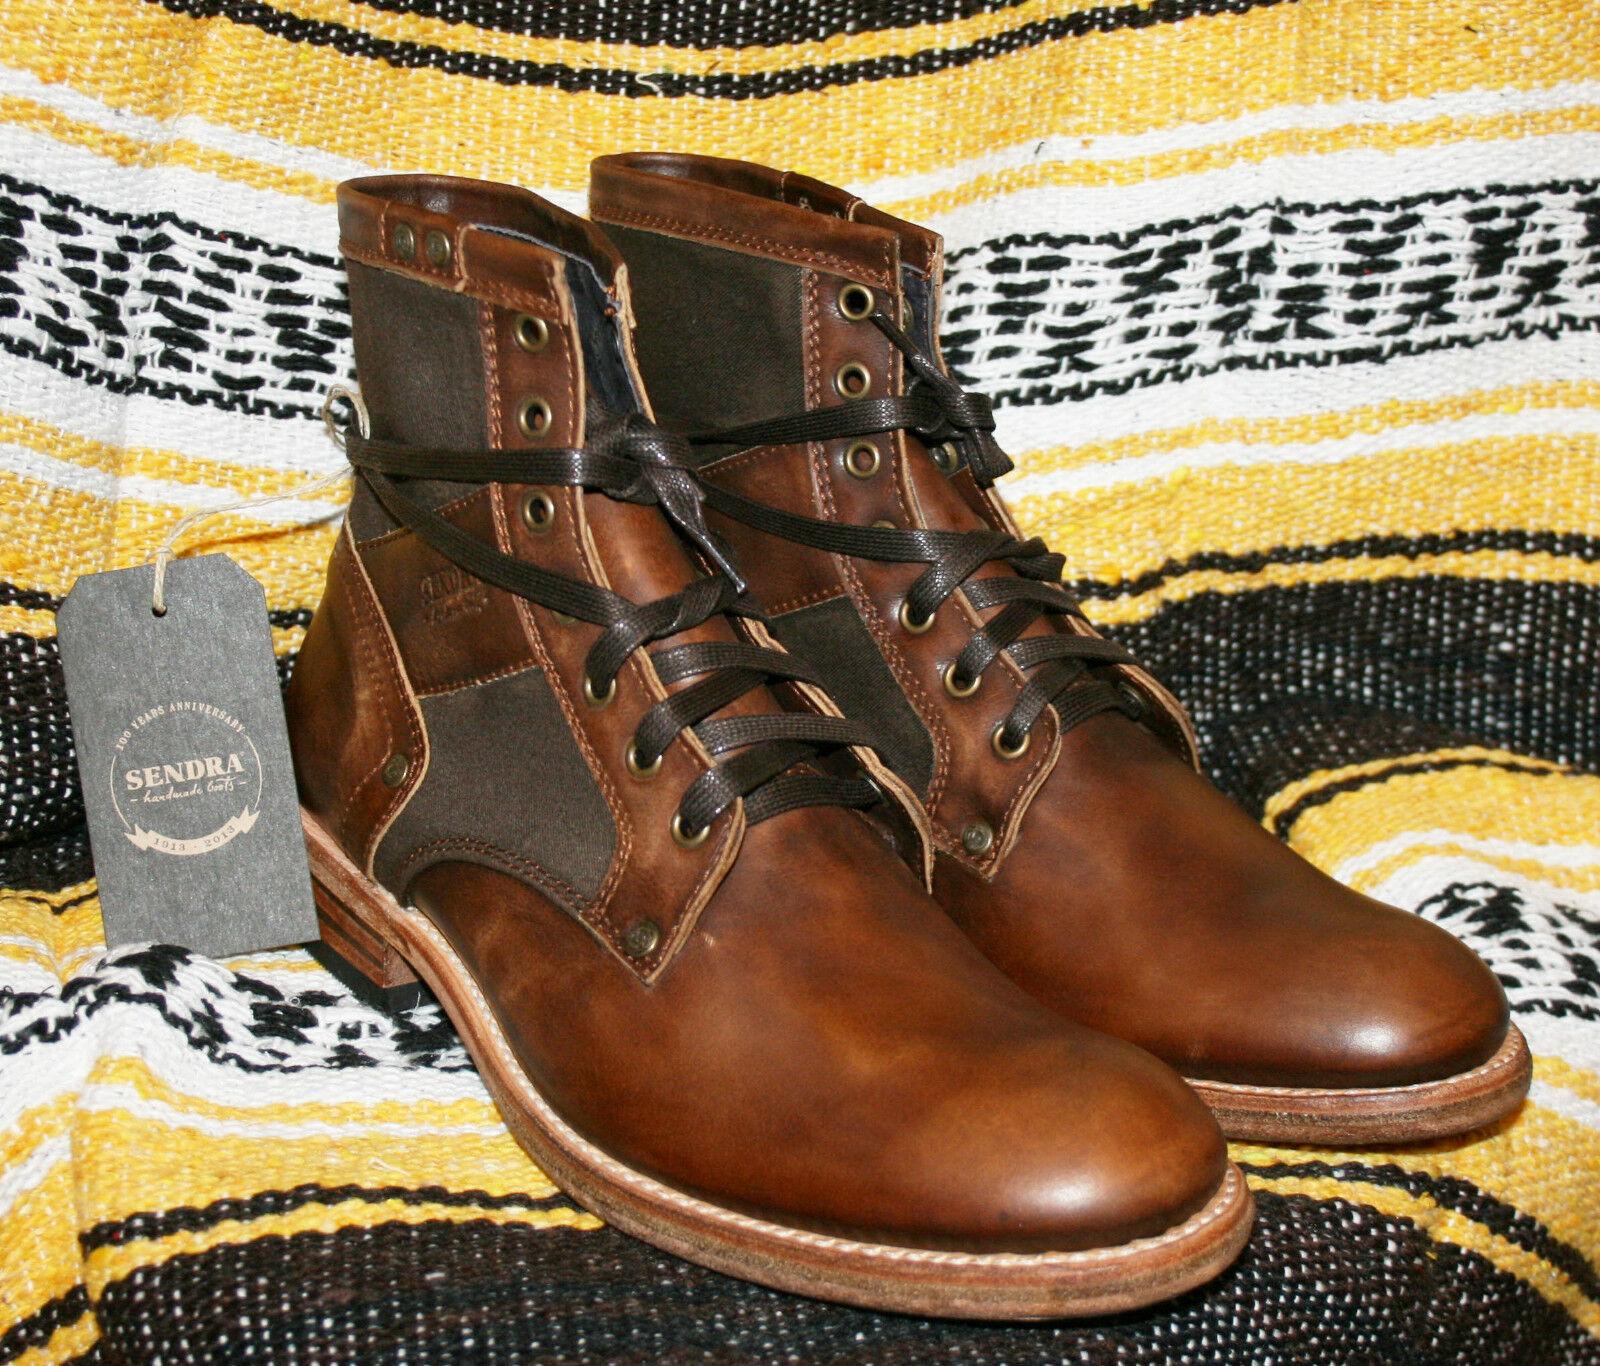 11931 Sendra chaussure brun Superbe promo